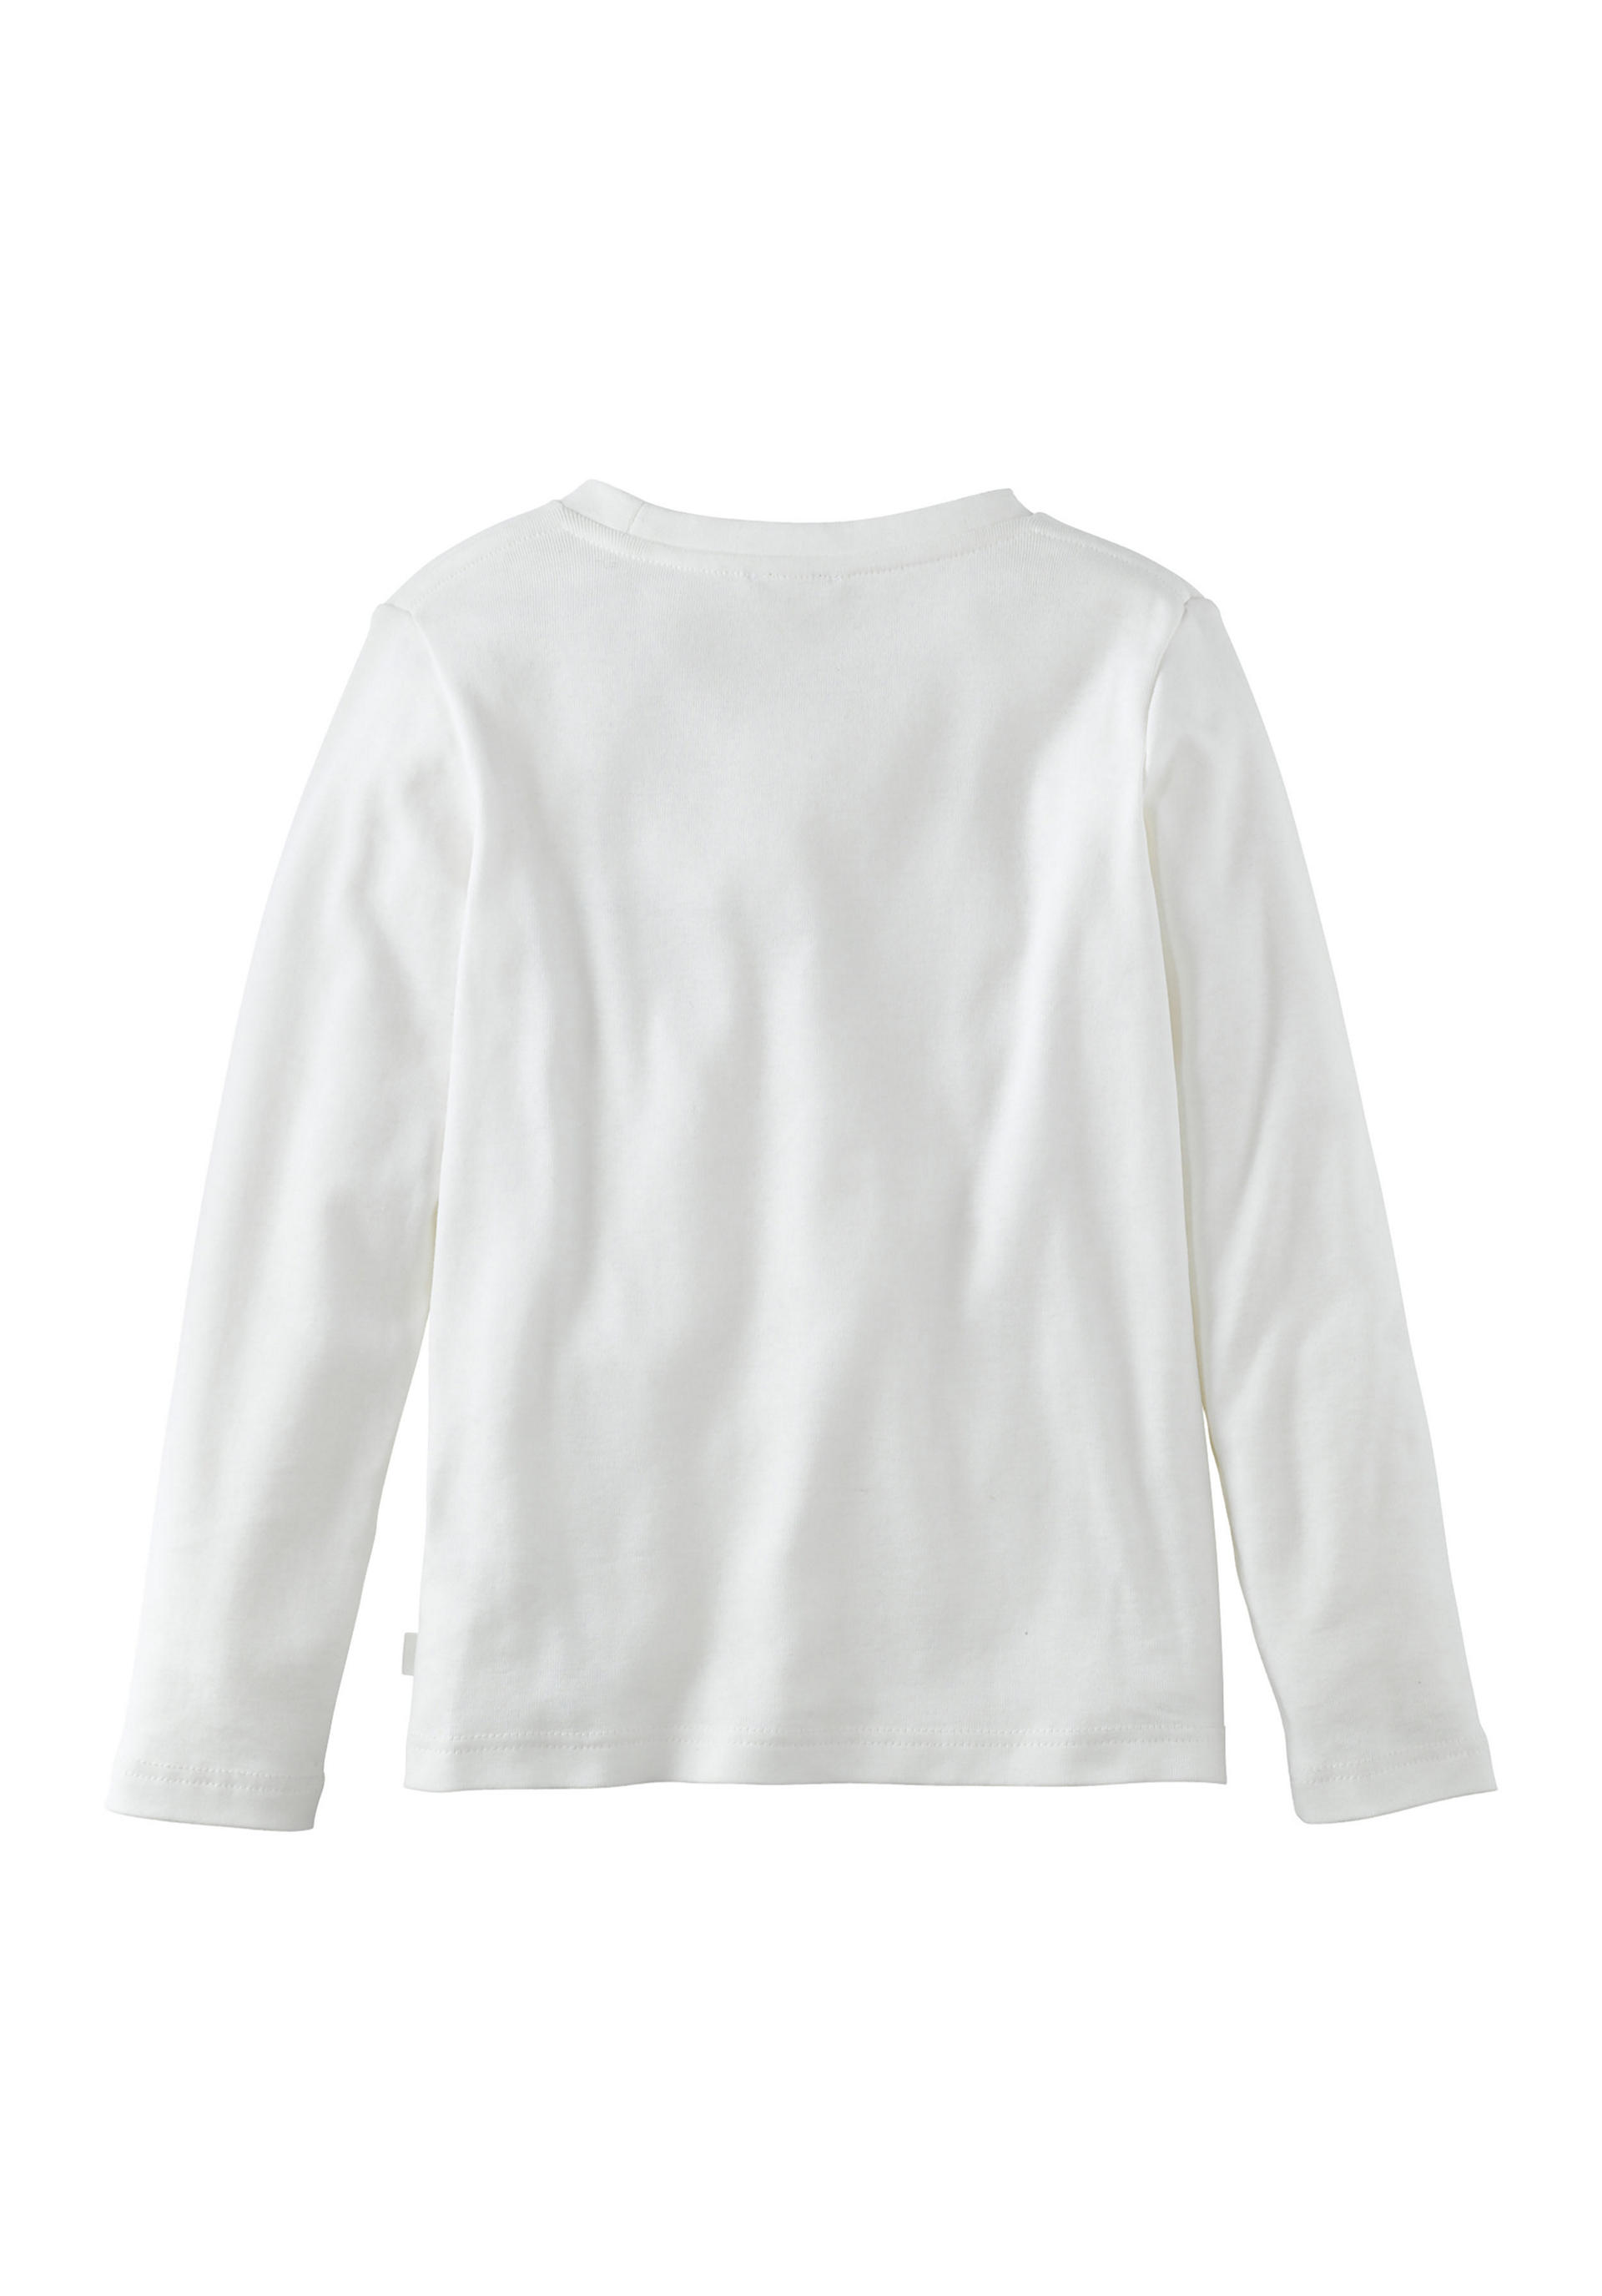 b764f2dbc660cc Langarmshirt aus reiner Bio-Baumwolle Langarmshirt aus reiner Bio-Baumwolle  ...